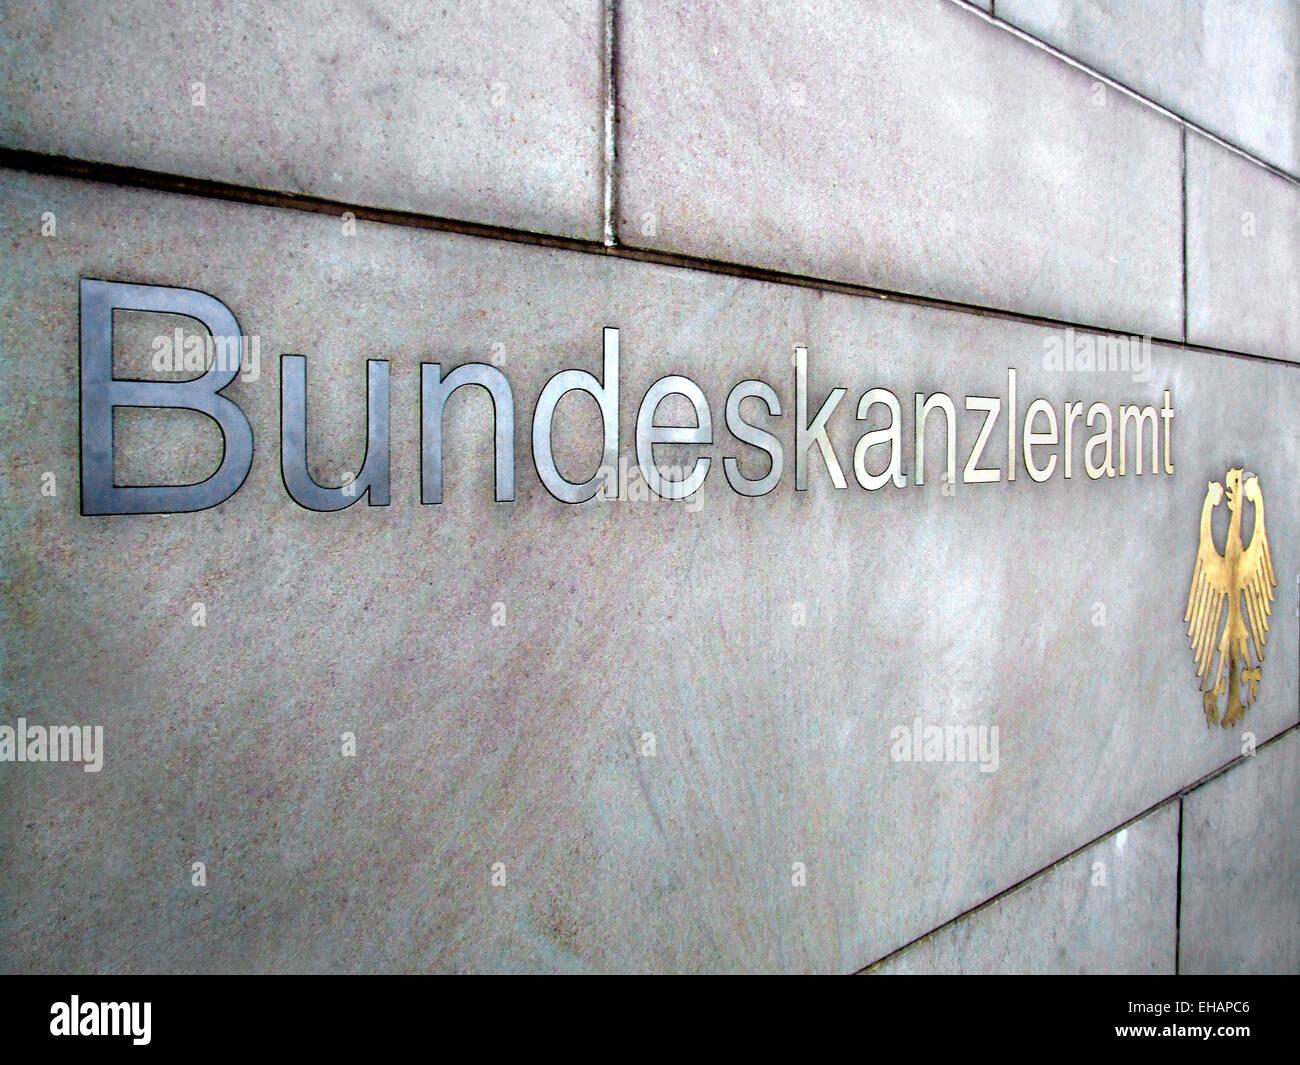 Bundeskanzleramt / federal chancellery Stock Photo